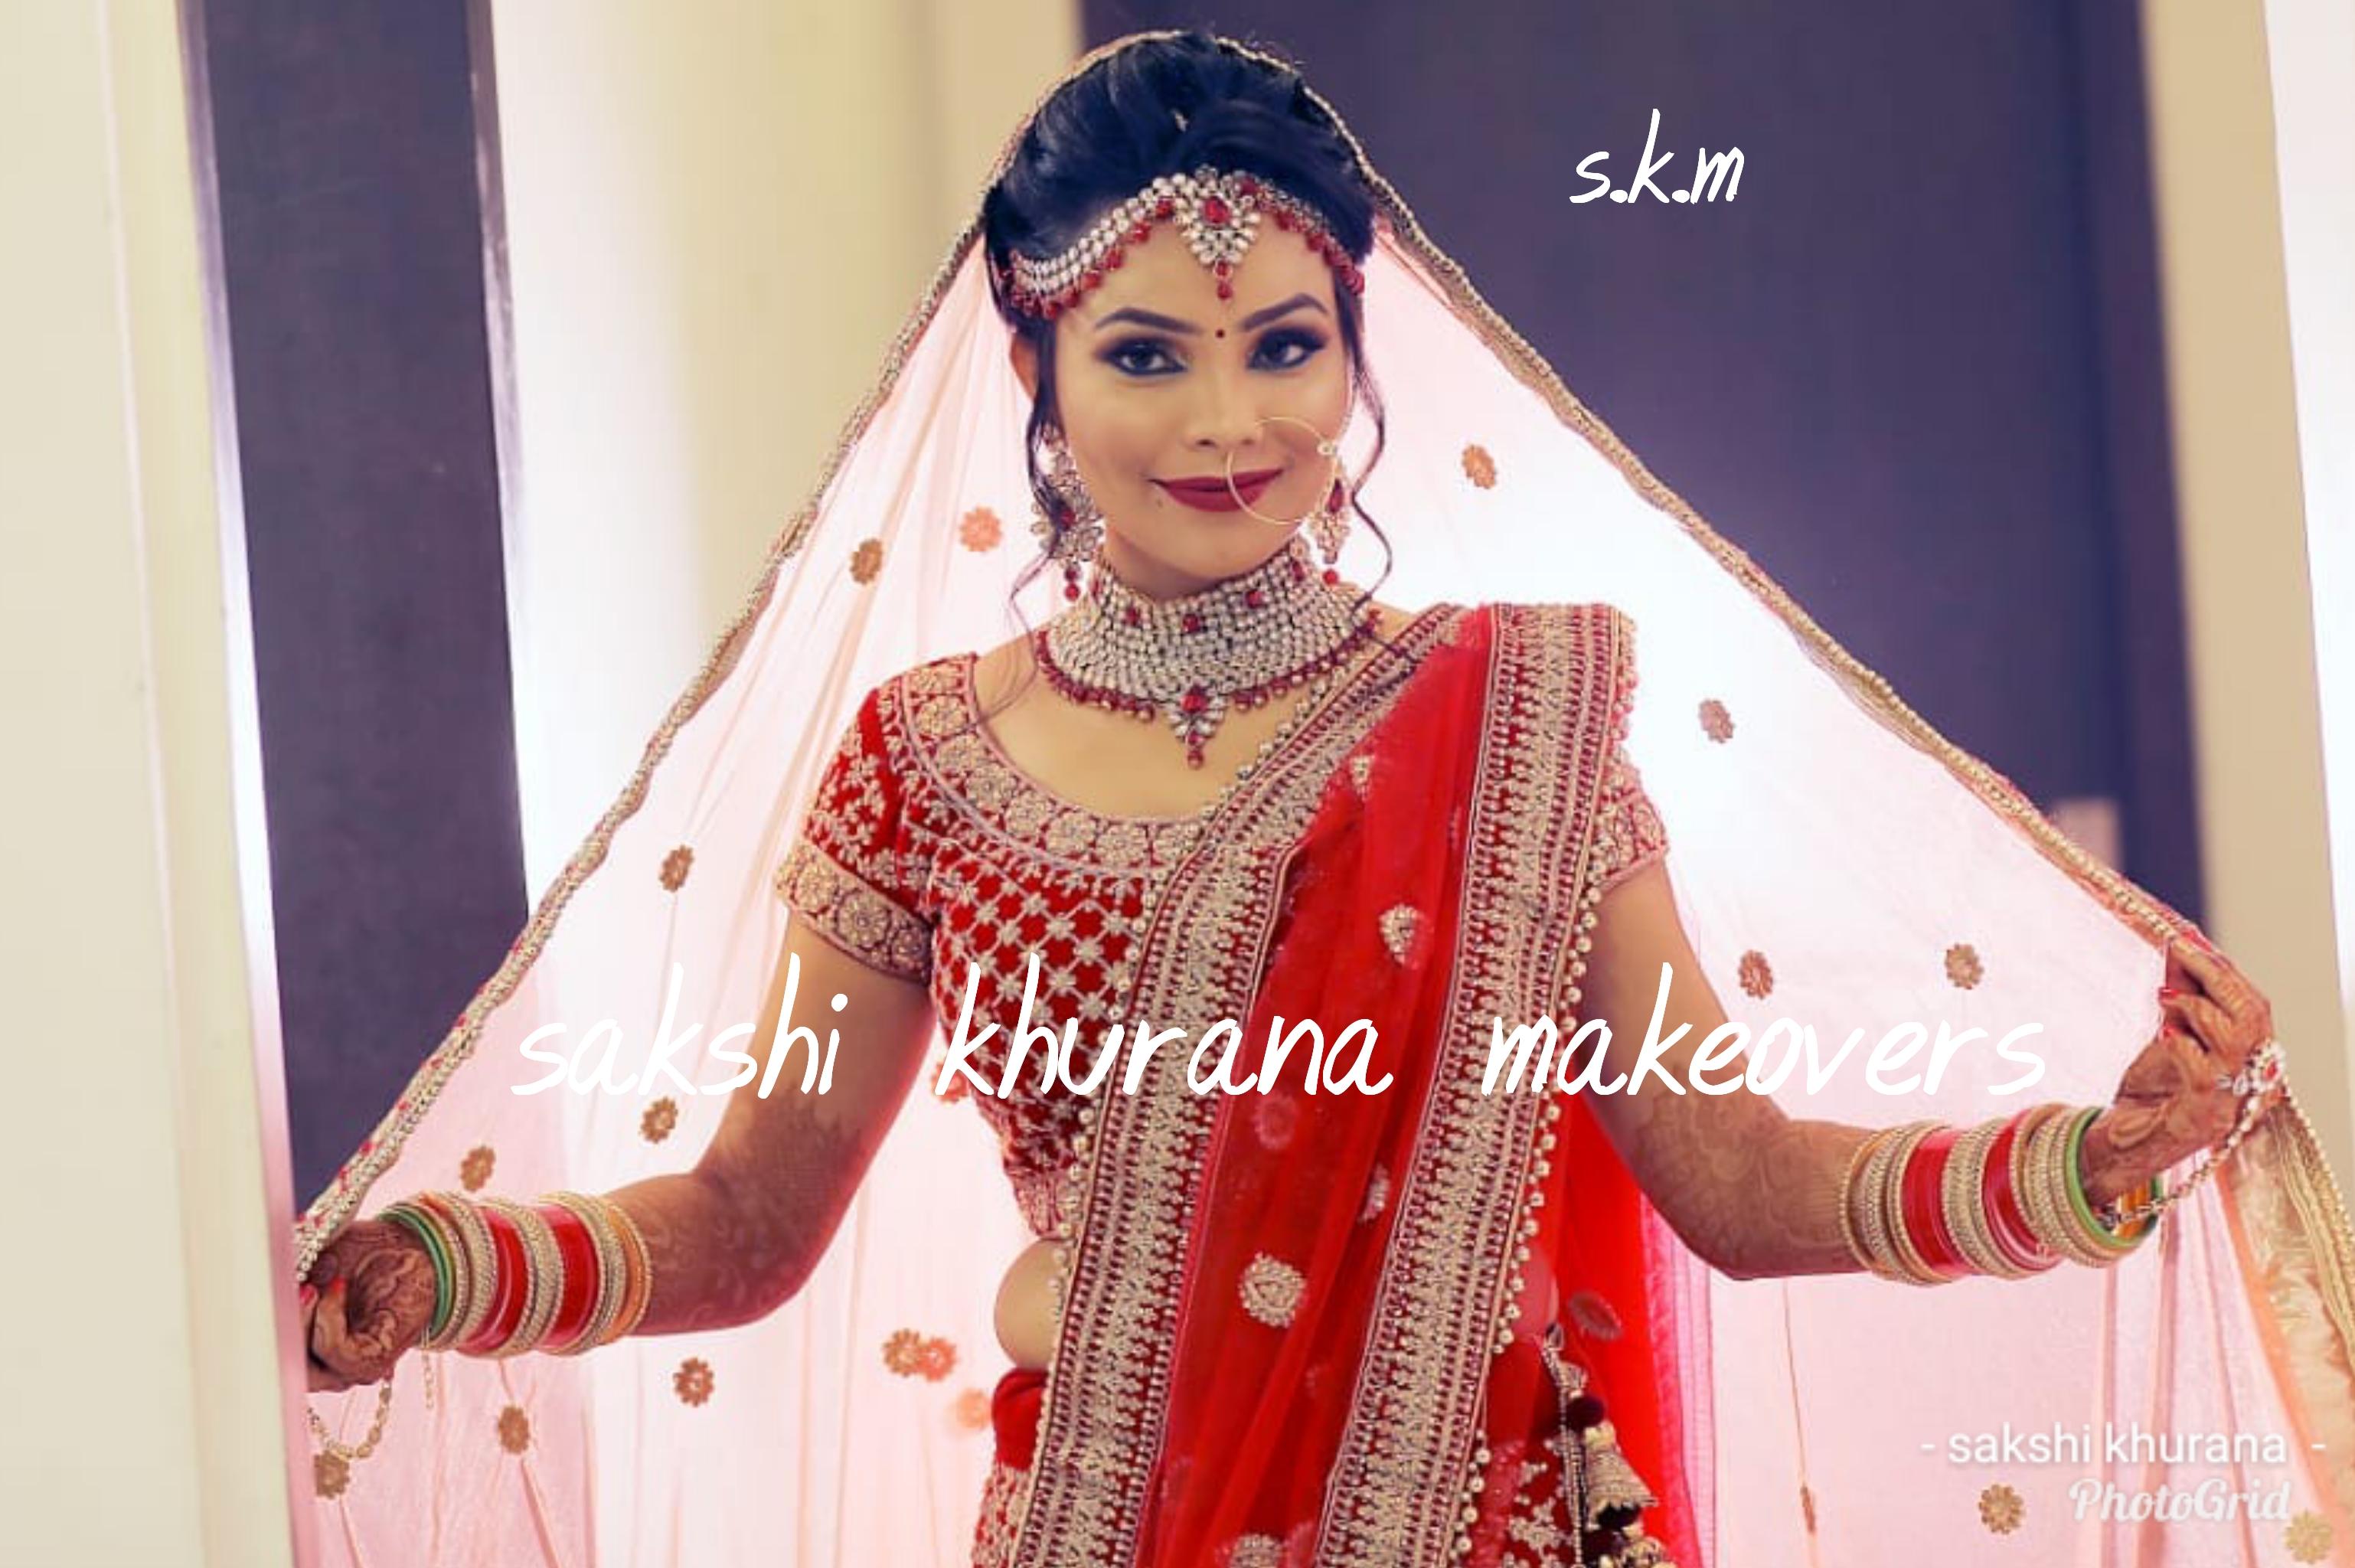 sakshi-khurana-makeovers-makeup-artist-delhi-ncr